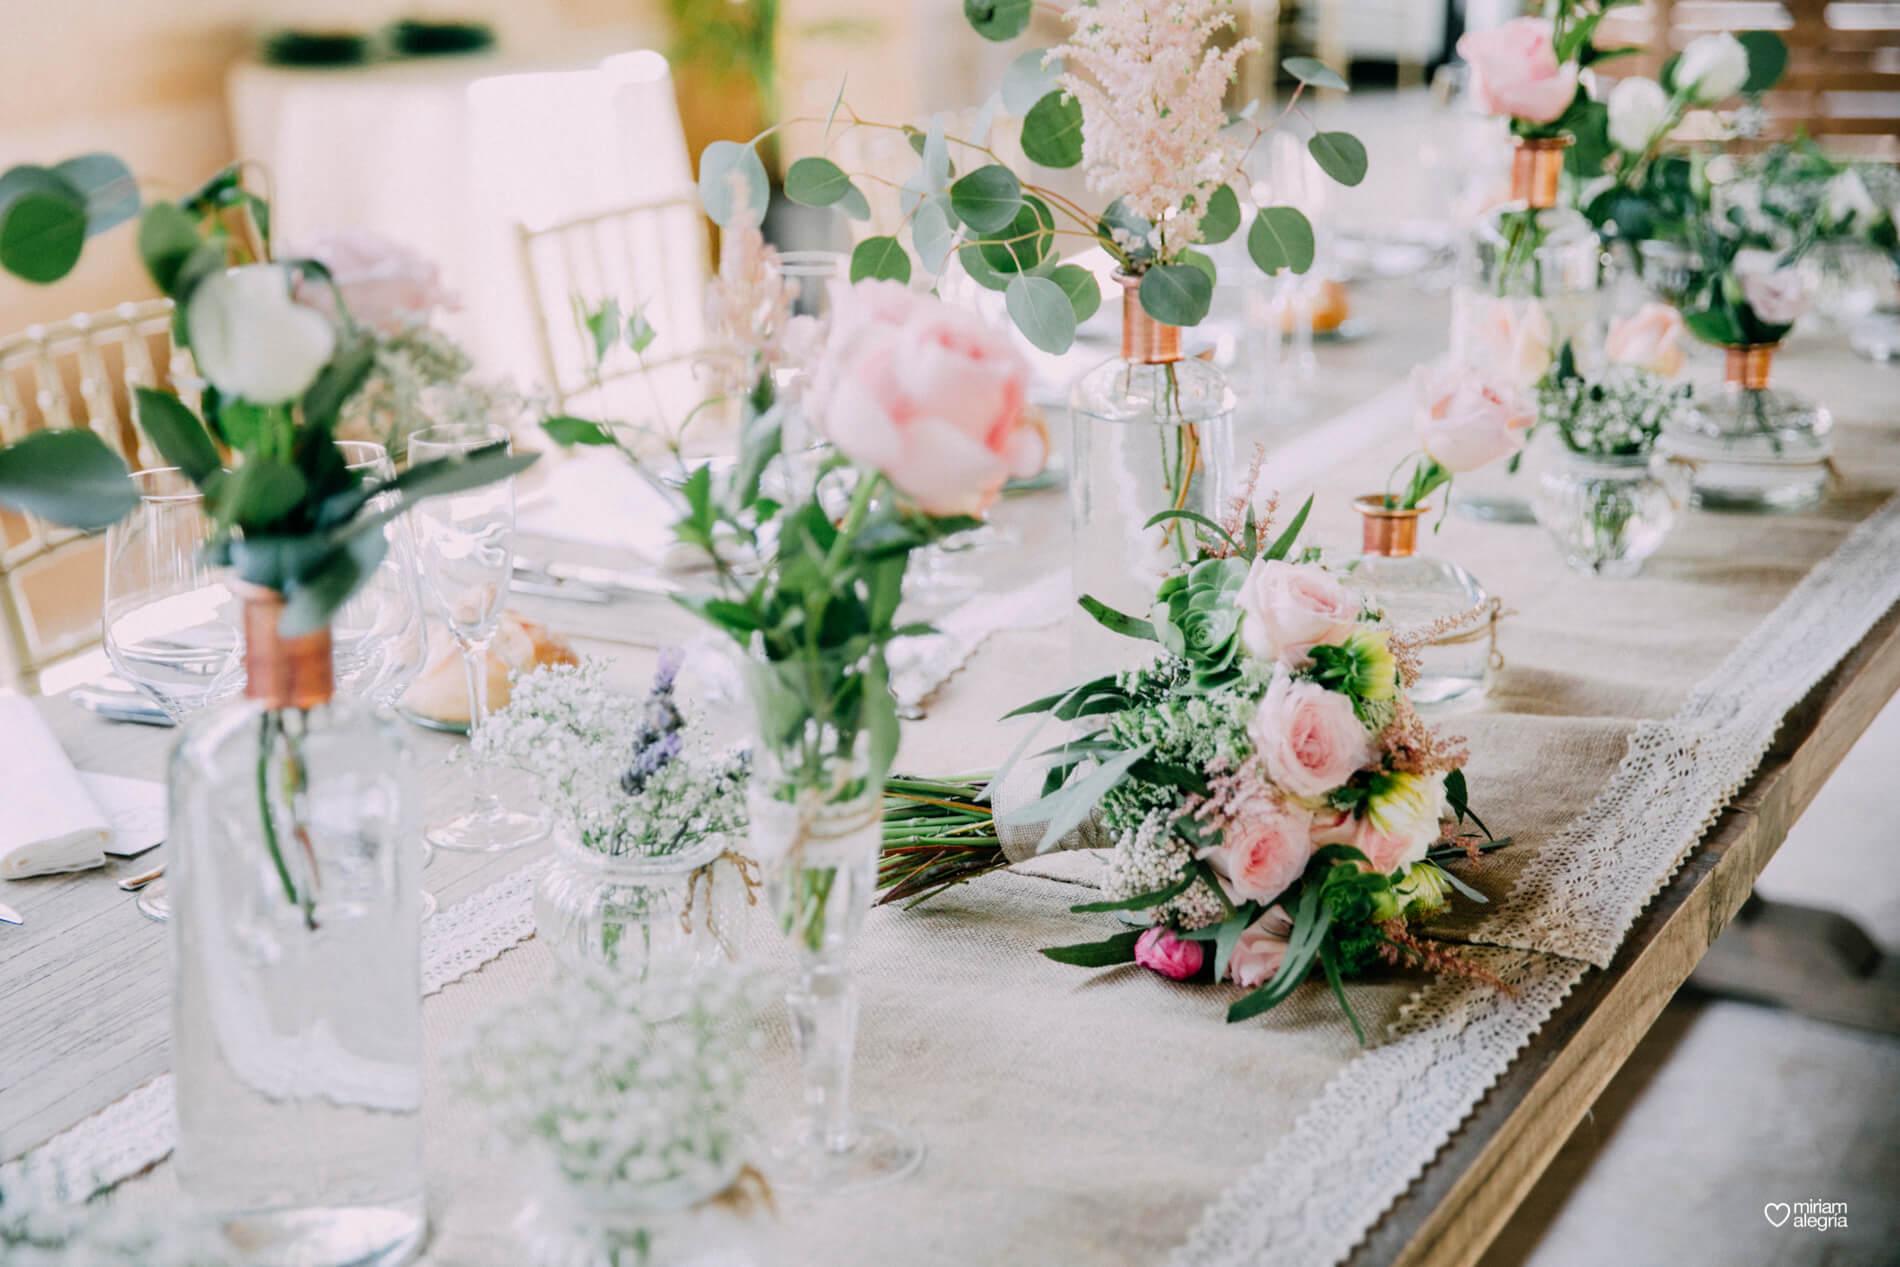 boda-en-finca-jurosa-miriam-alegria-99